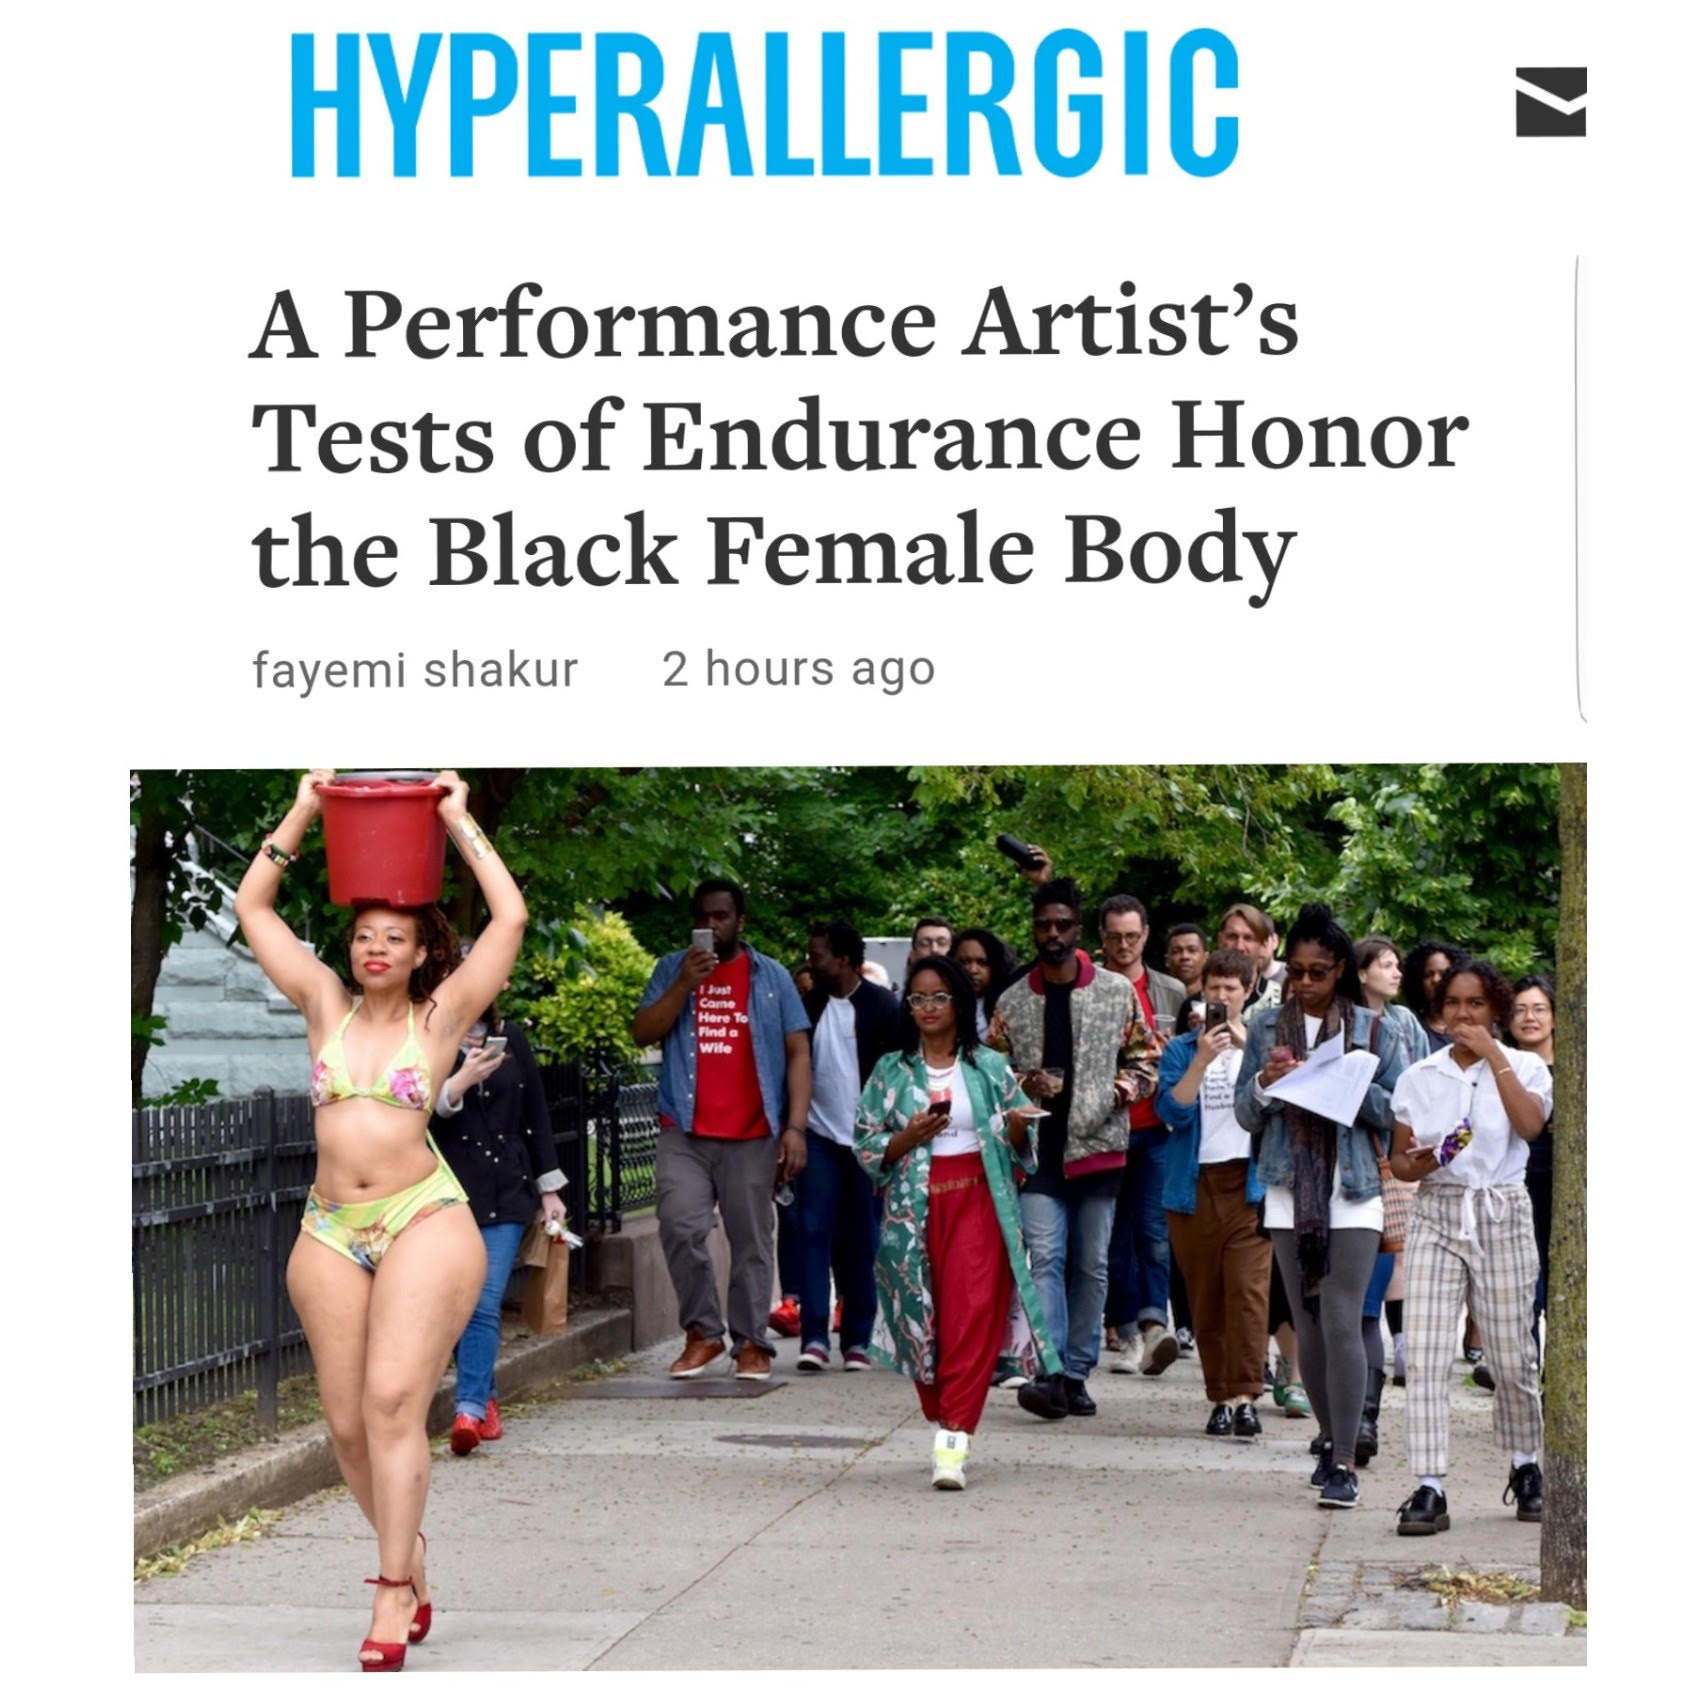 https://hyperallergic.com/448242/ayana-evans-medium-tings-performance/